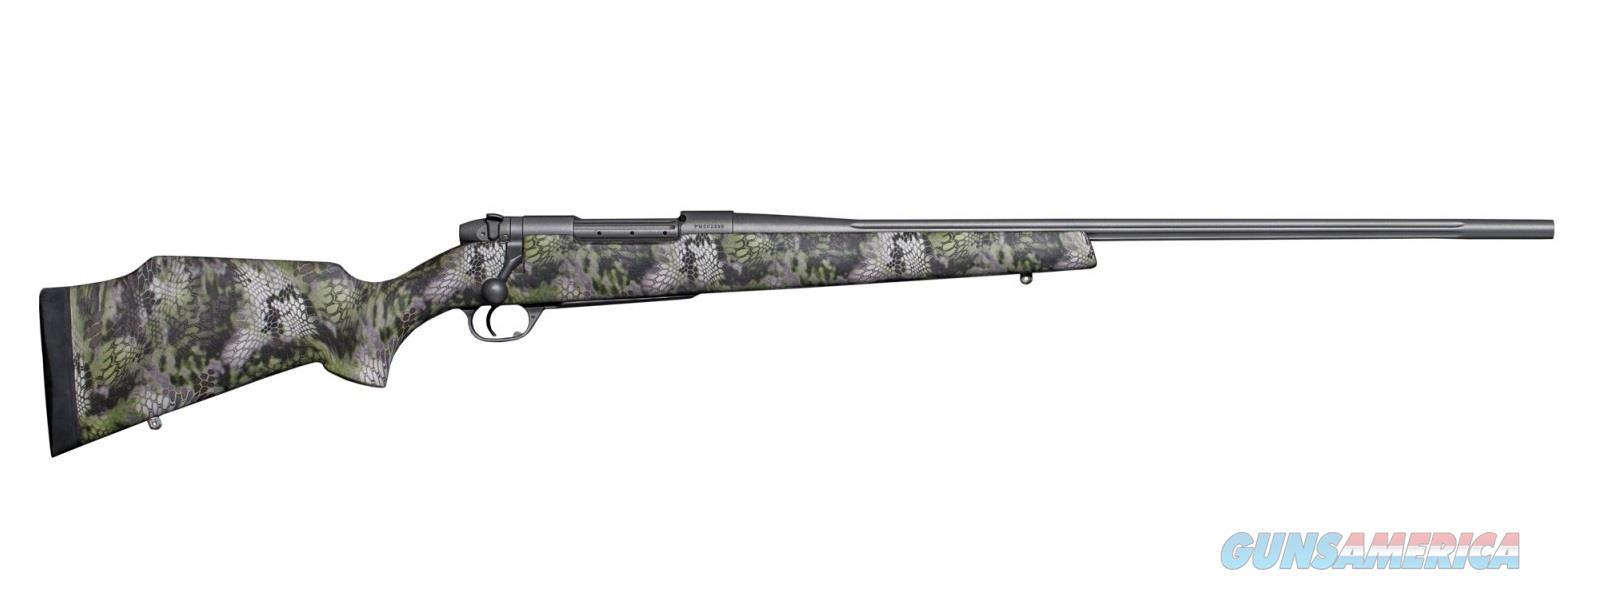 Weatherby Mark V Altitude 6.5-300 Wby Mag Kryptek Altitude MALM653WR8B   Guns > Rifles > Weatherby Rifles > Sporting